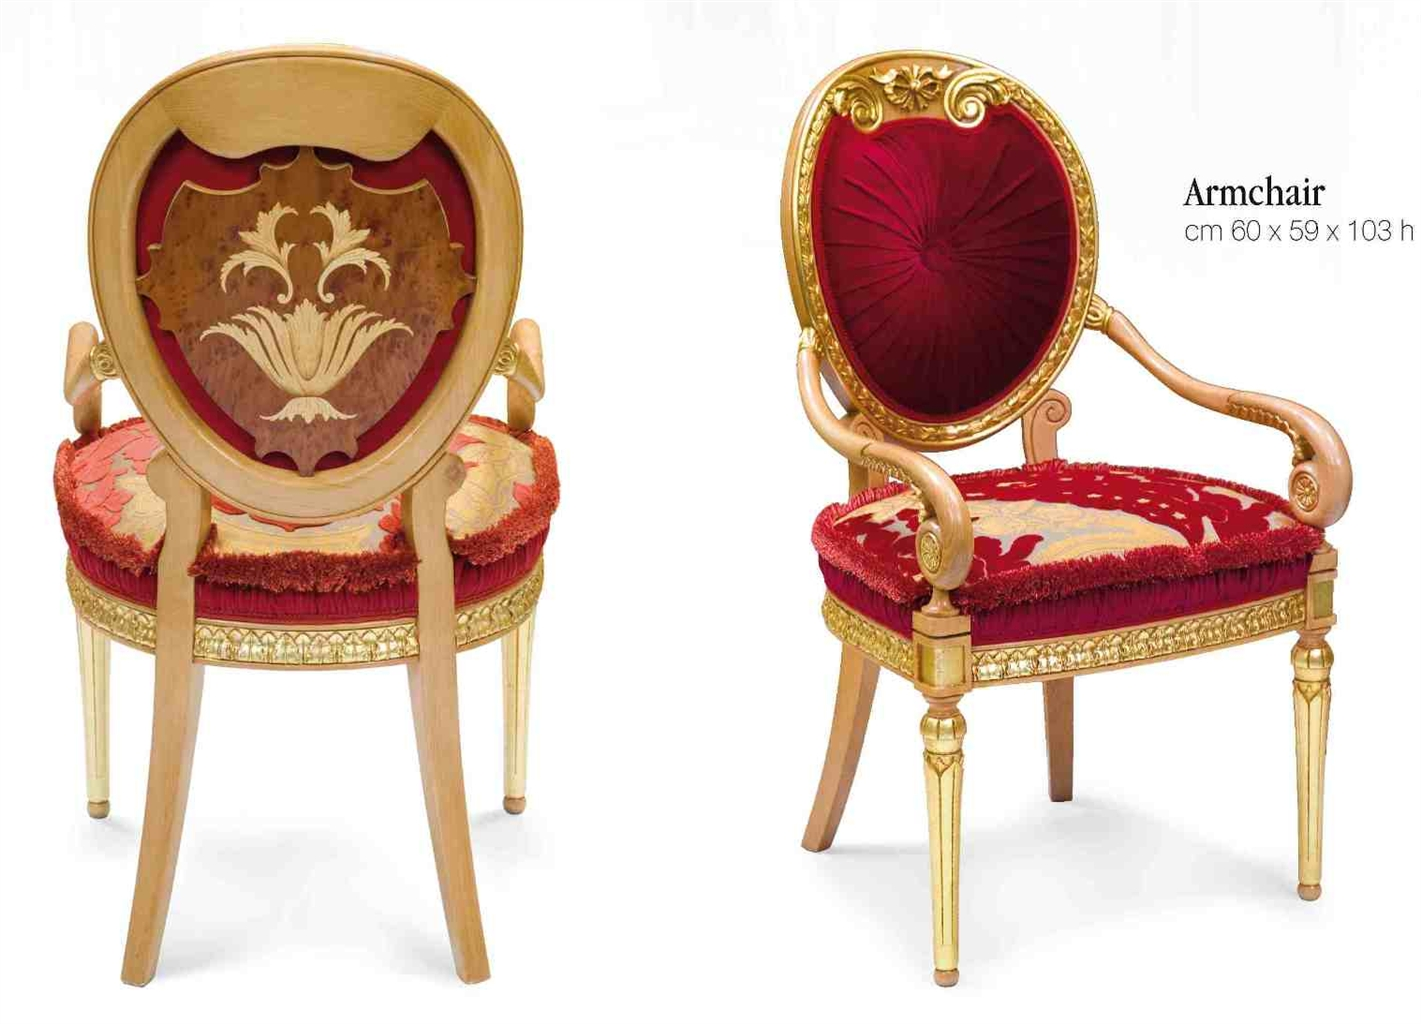 luxury handmade furniture imported from europe many sizes